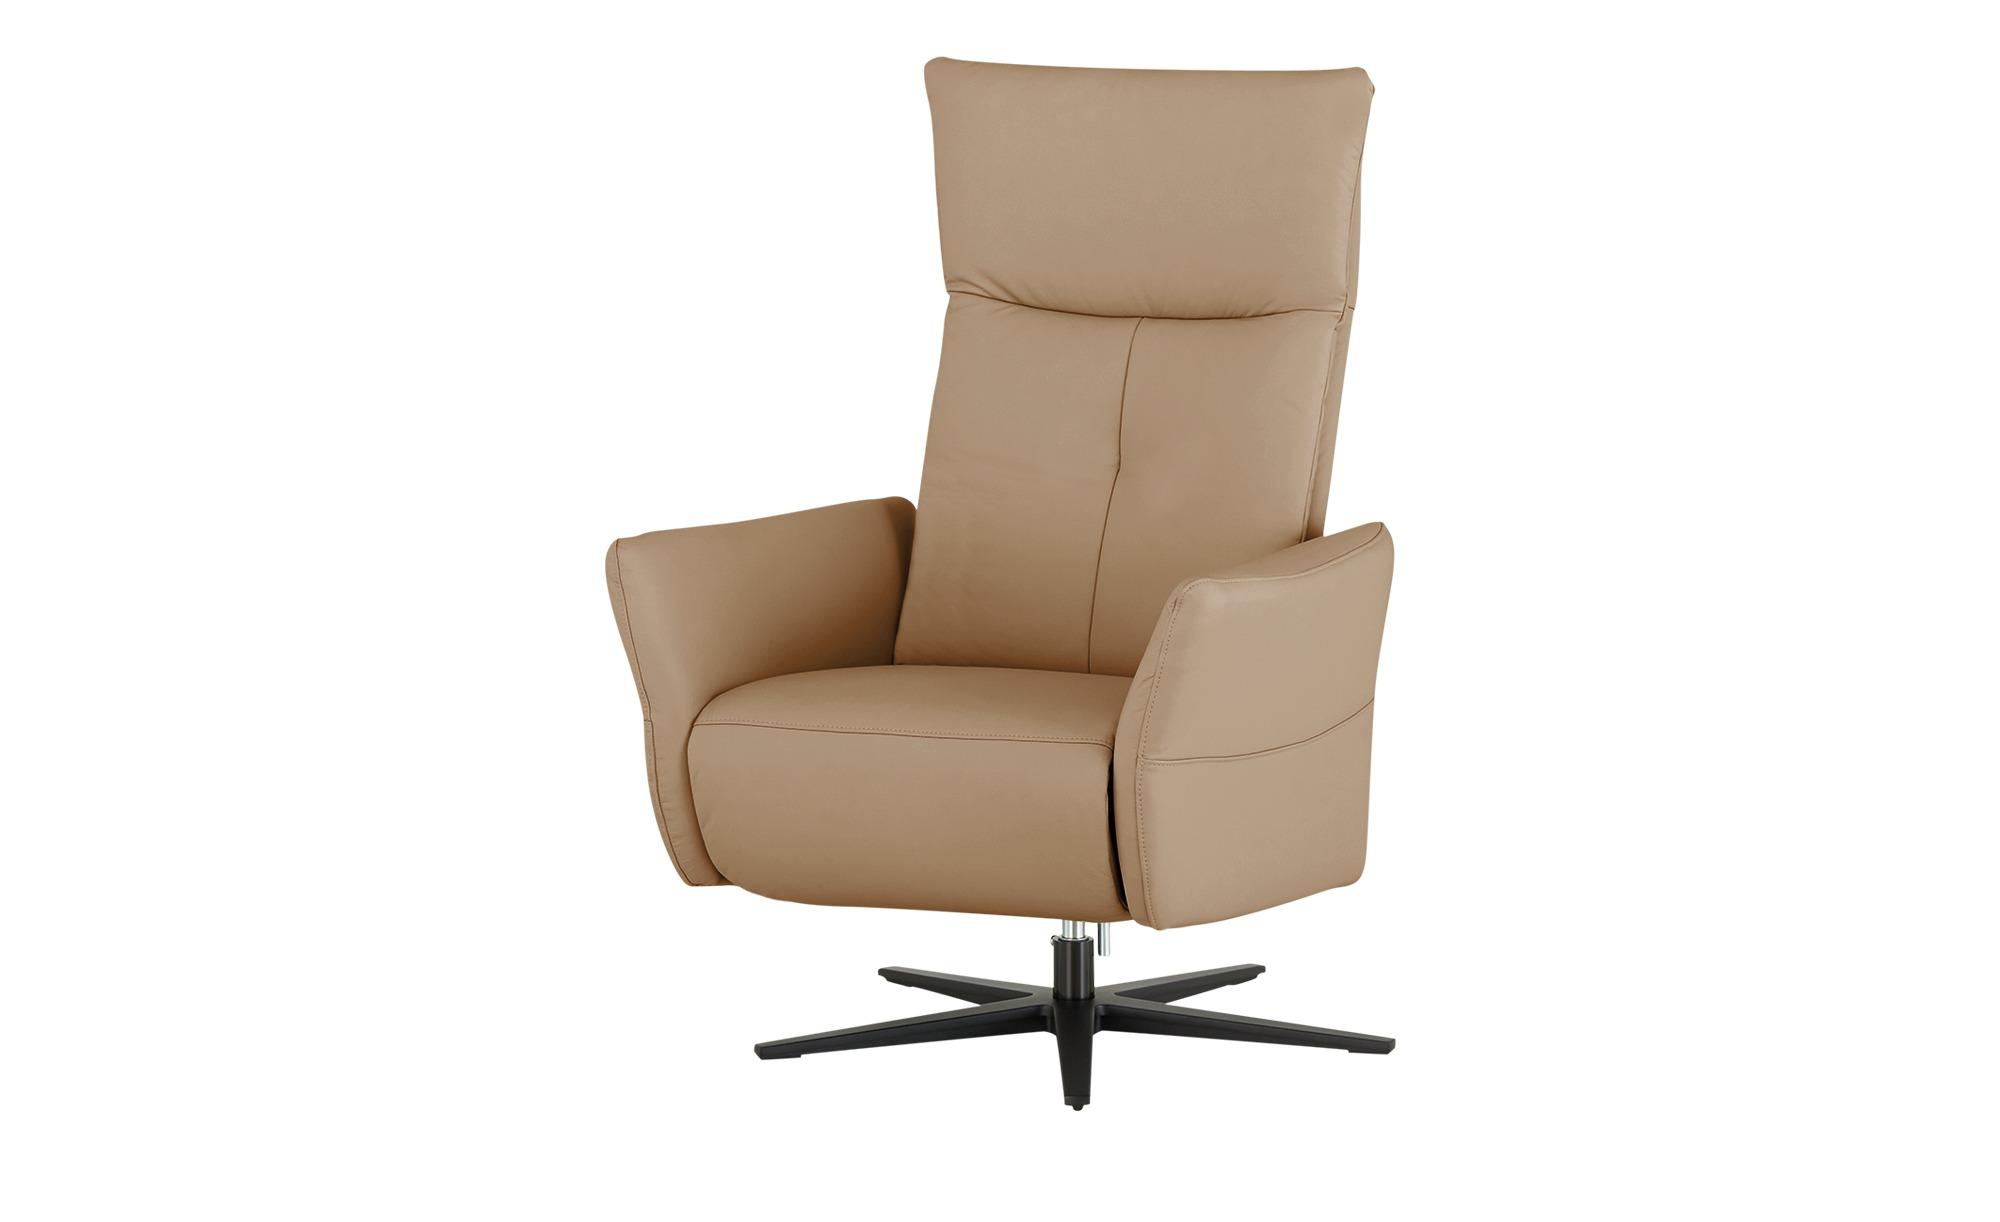 Wohnwert Funktionssessel  Katja ¦ braun ¦ Maße (cm): B: 79 H: 113 T: 80 Polstermöbel > Sessel > Drehsessel - Höffner